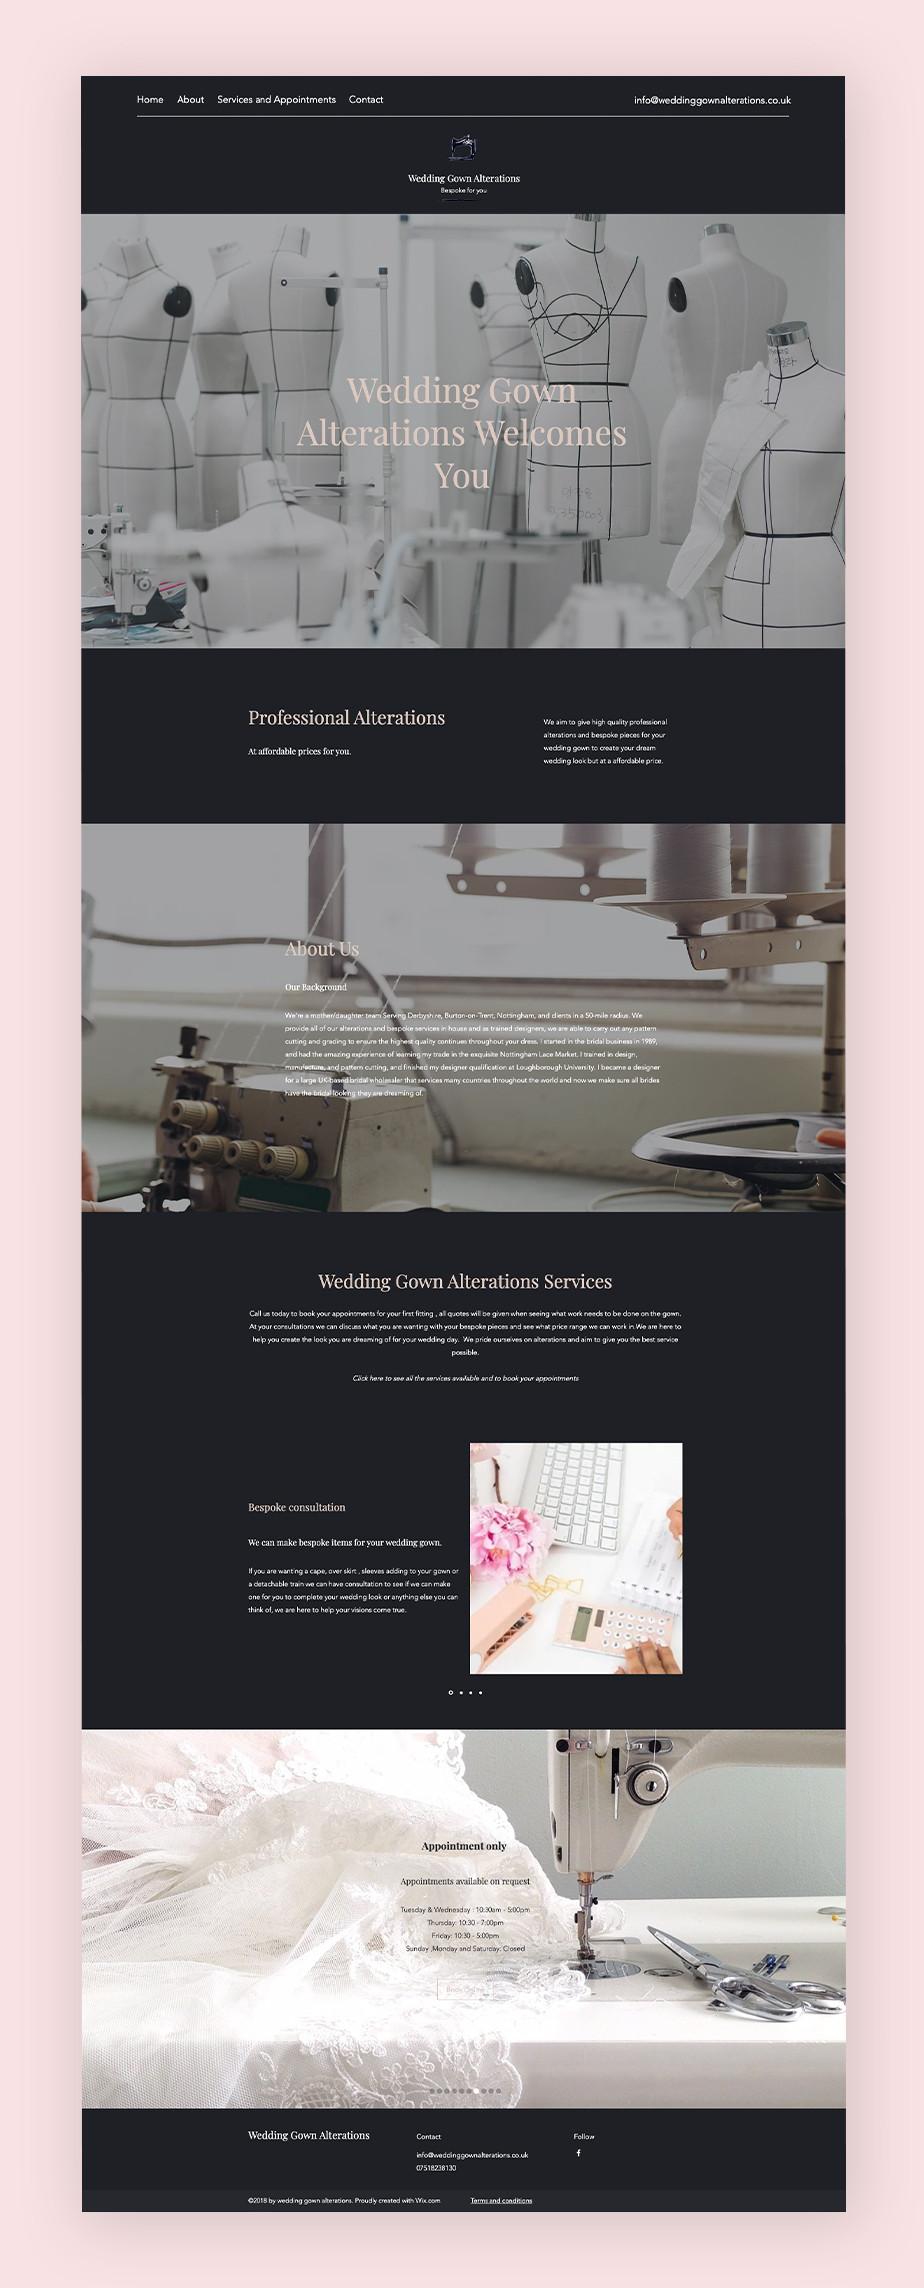 Exemplo de site que utiliza o Wix Bookings: atelier de noivas Wedding Gown Alterations